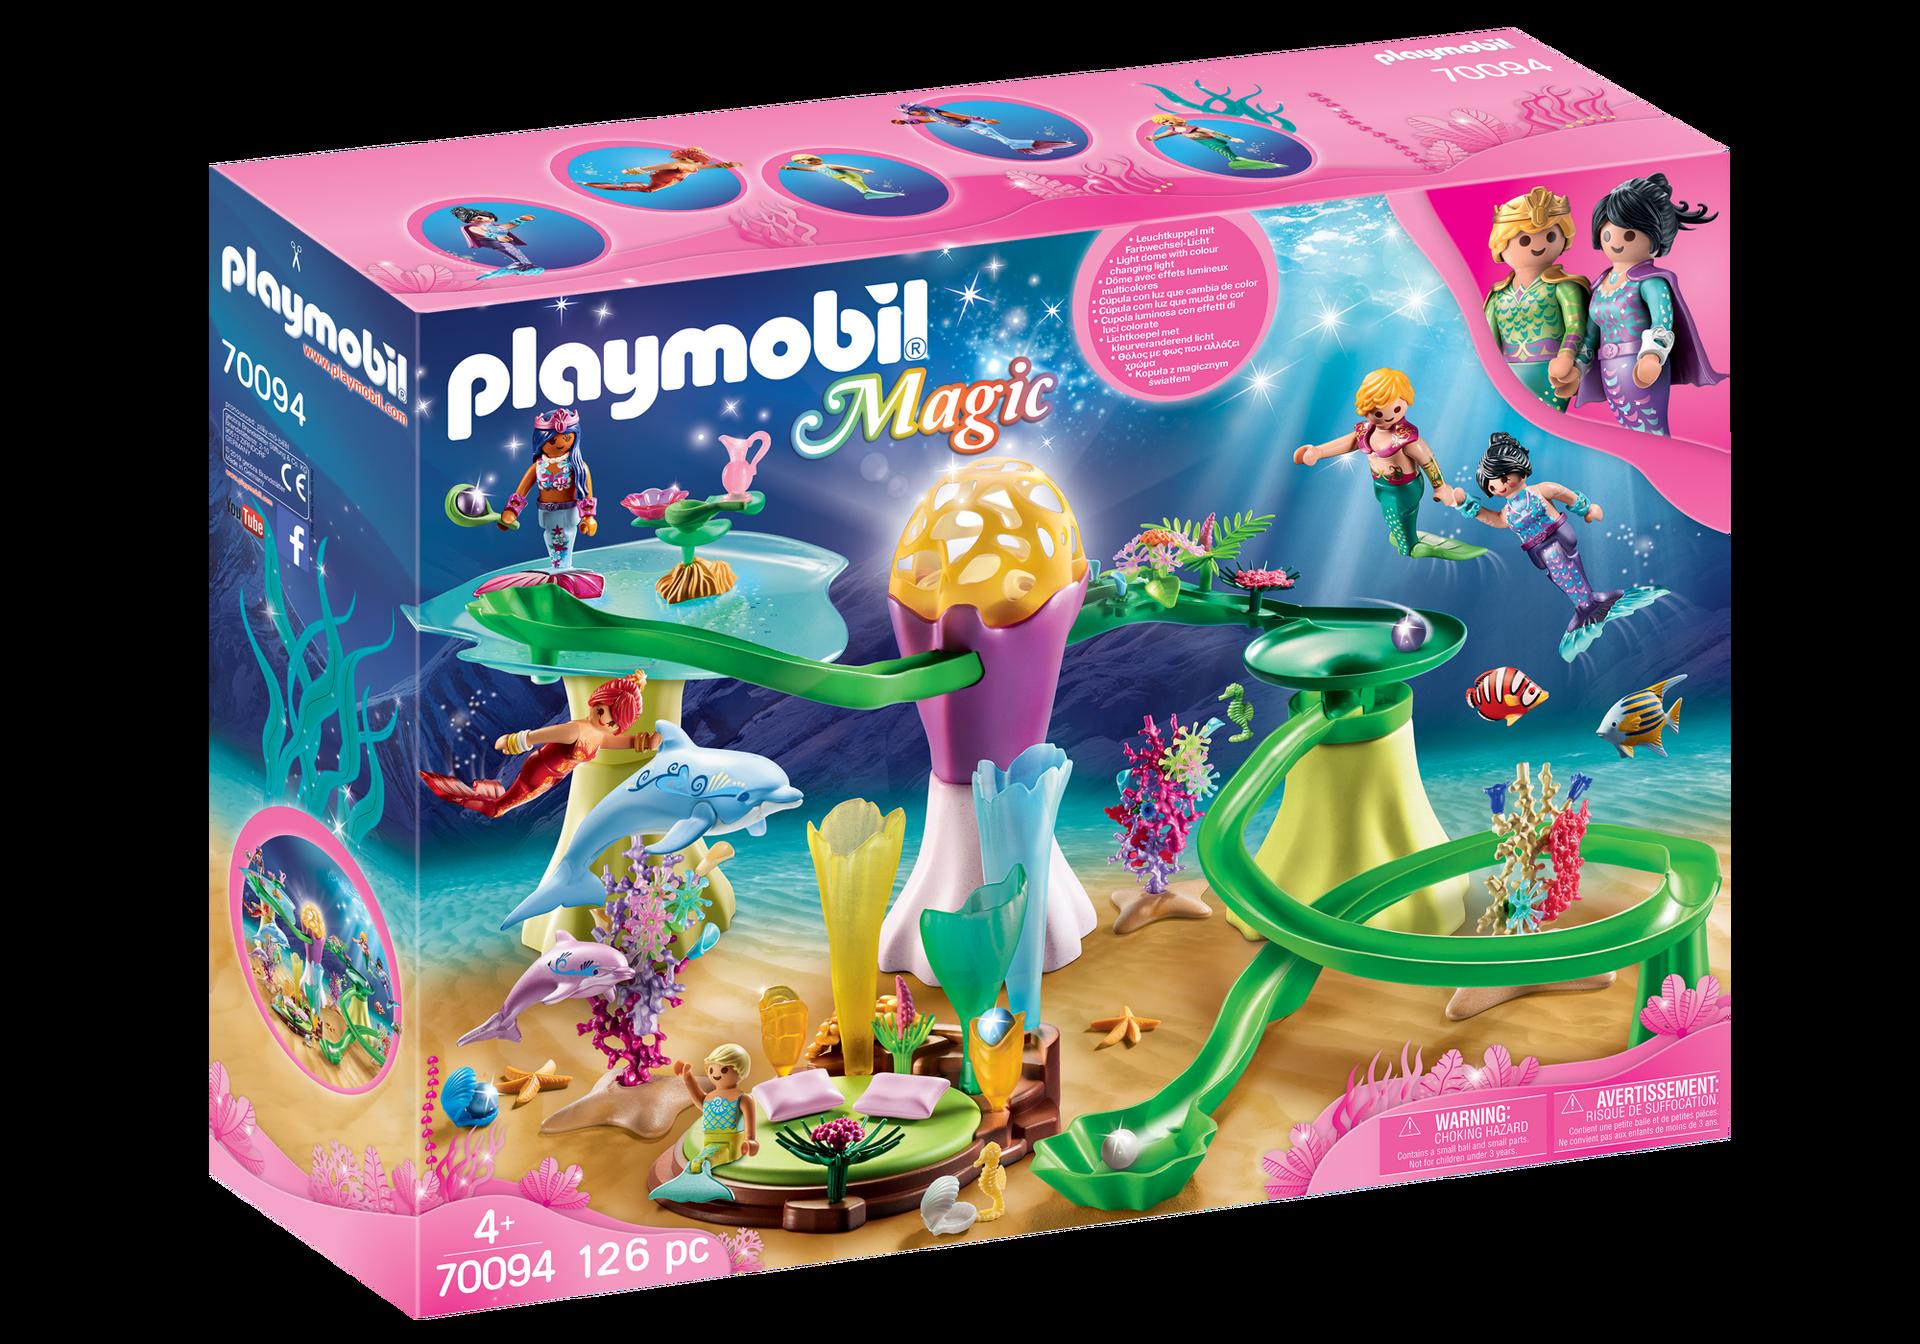 Playmobil - Magic - Coral Pavillon (70094)